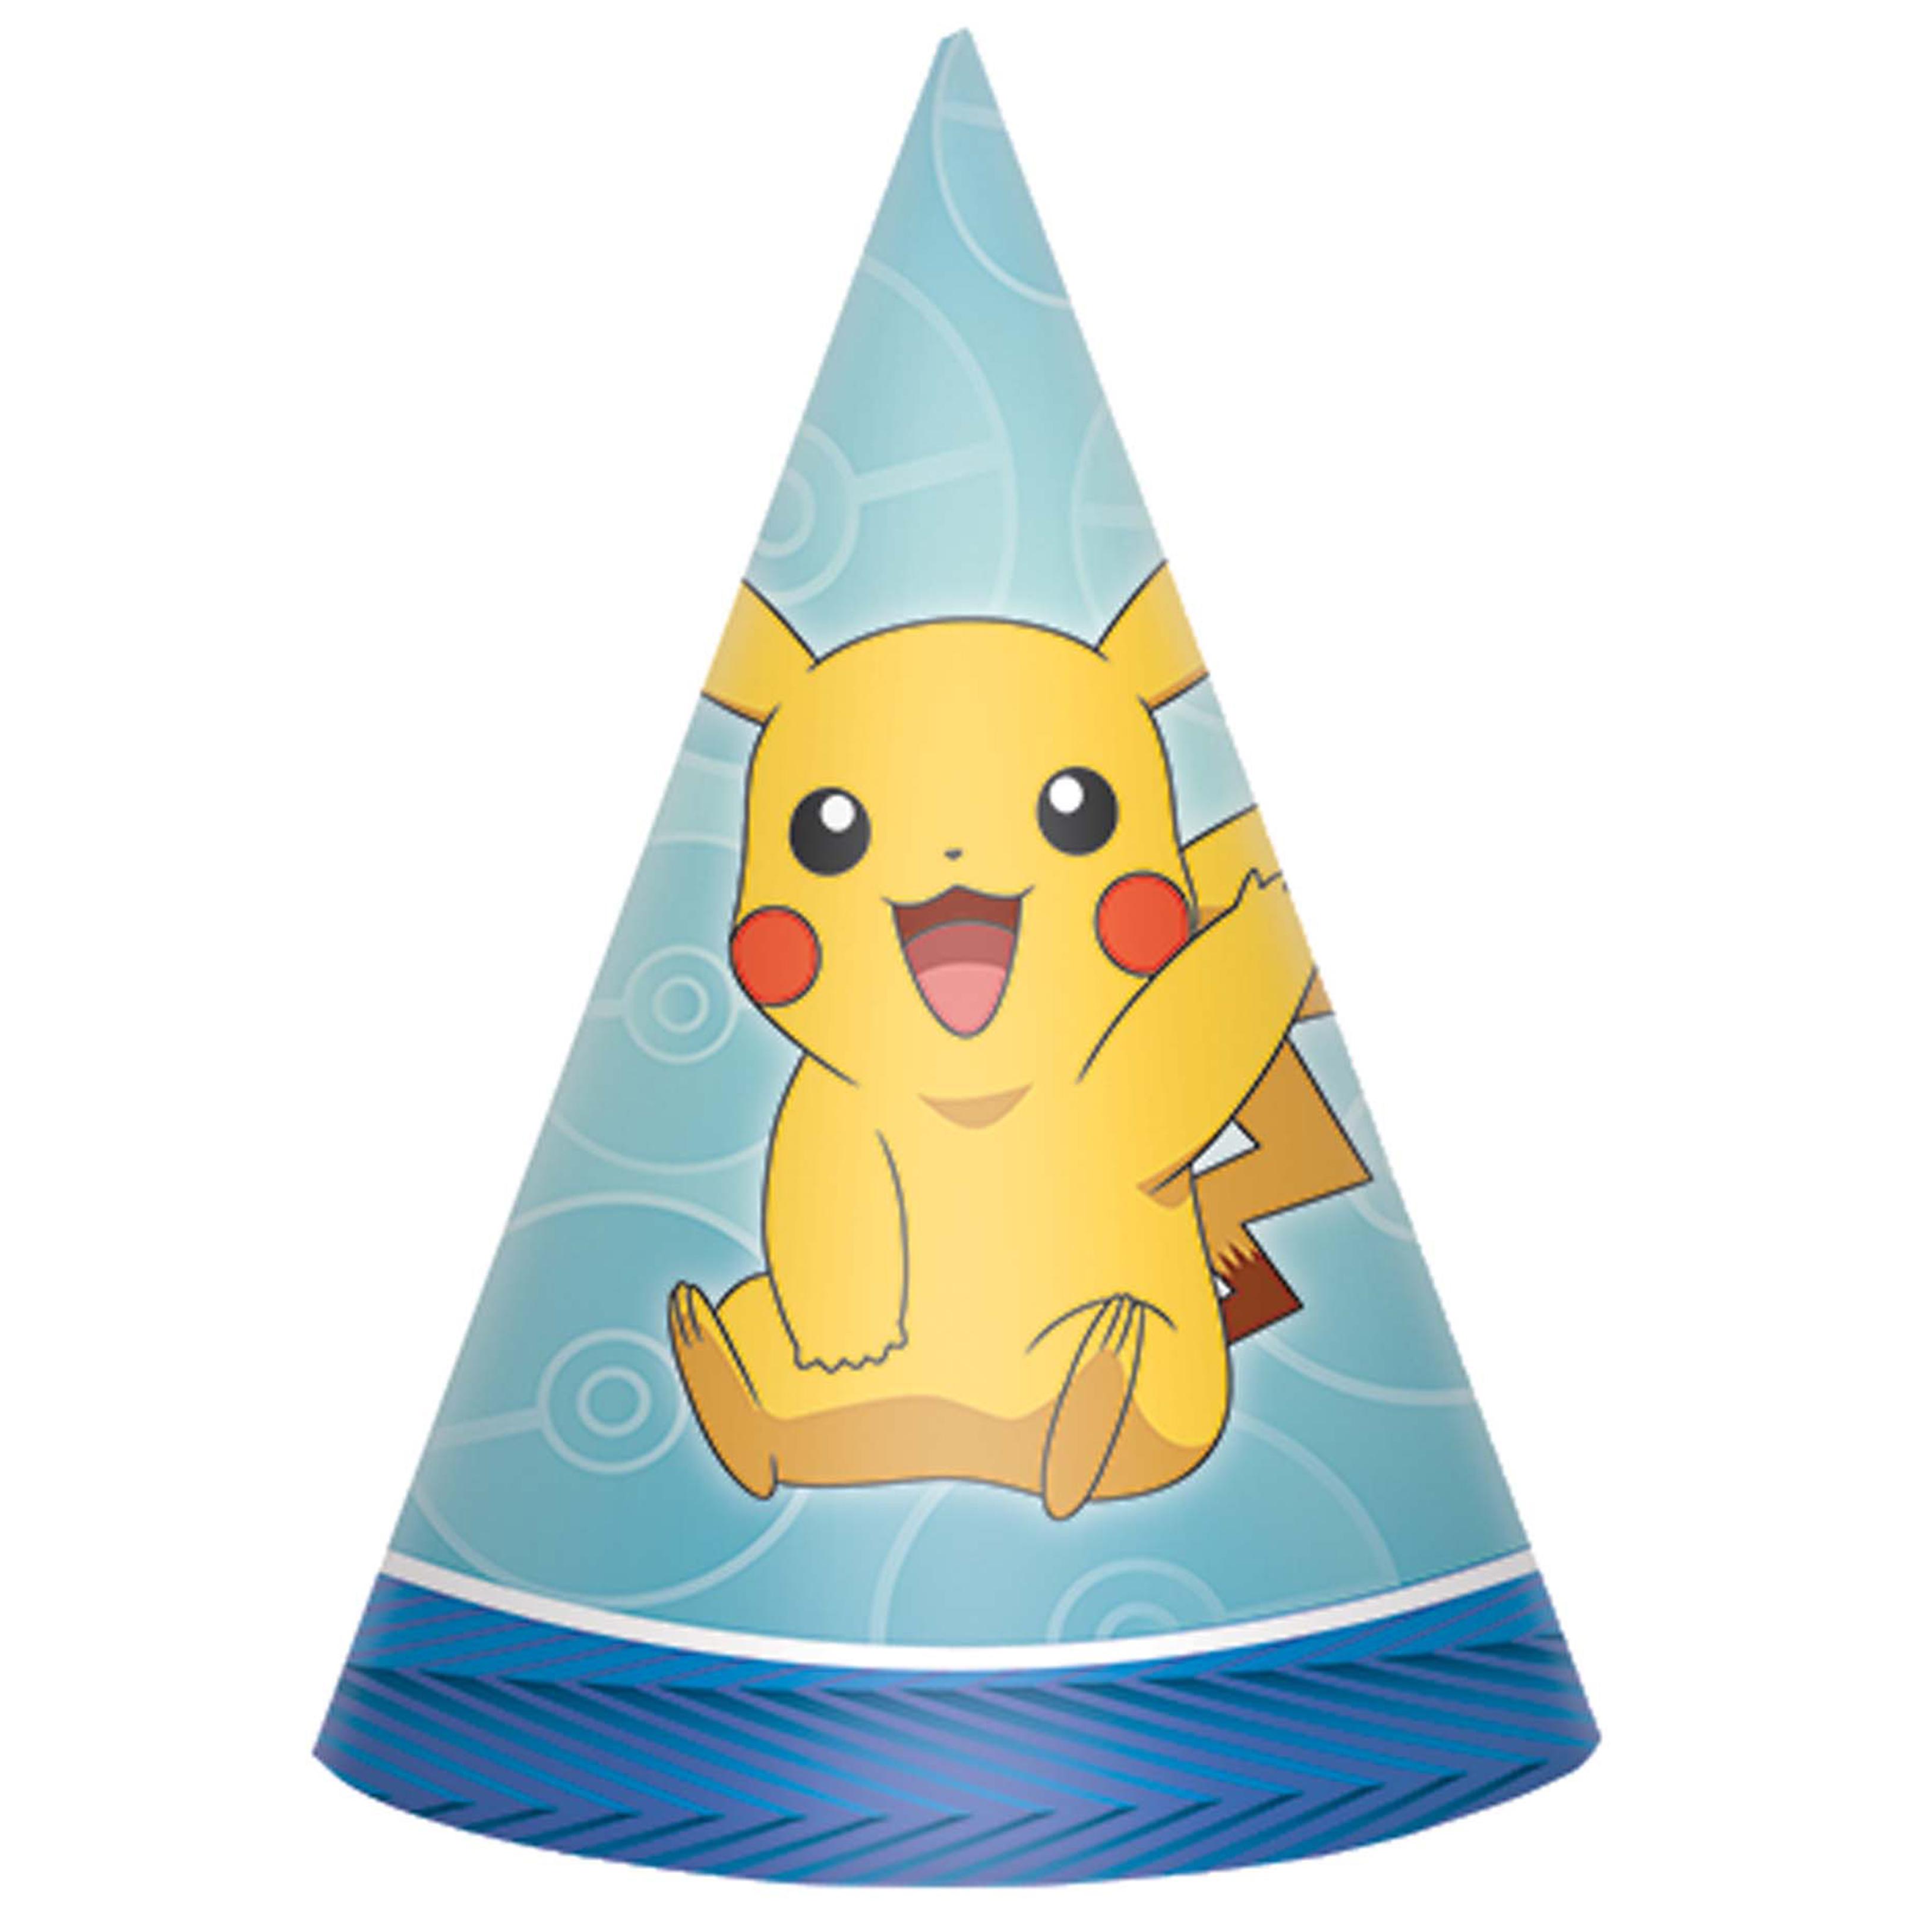 12 Pokemon Pikachu Party Cone Hats Birthday Tableware Boys Girls Nursery